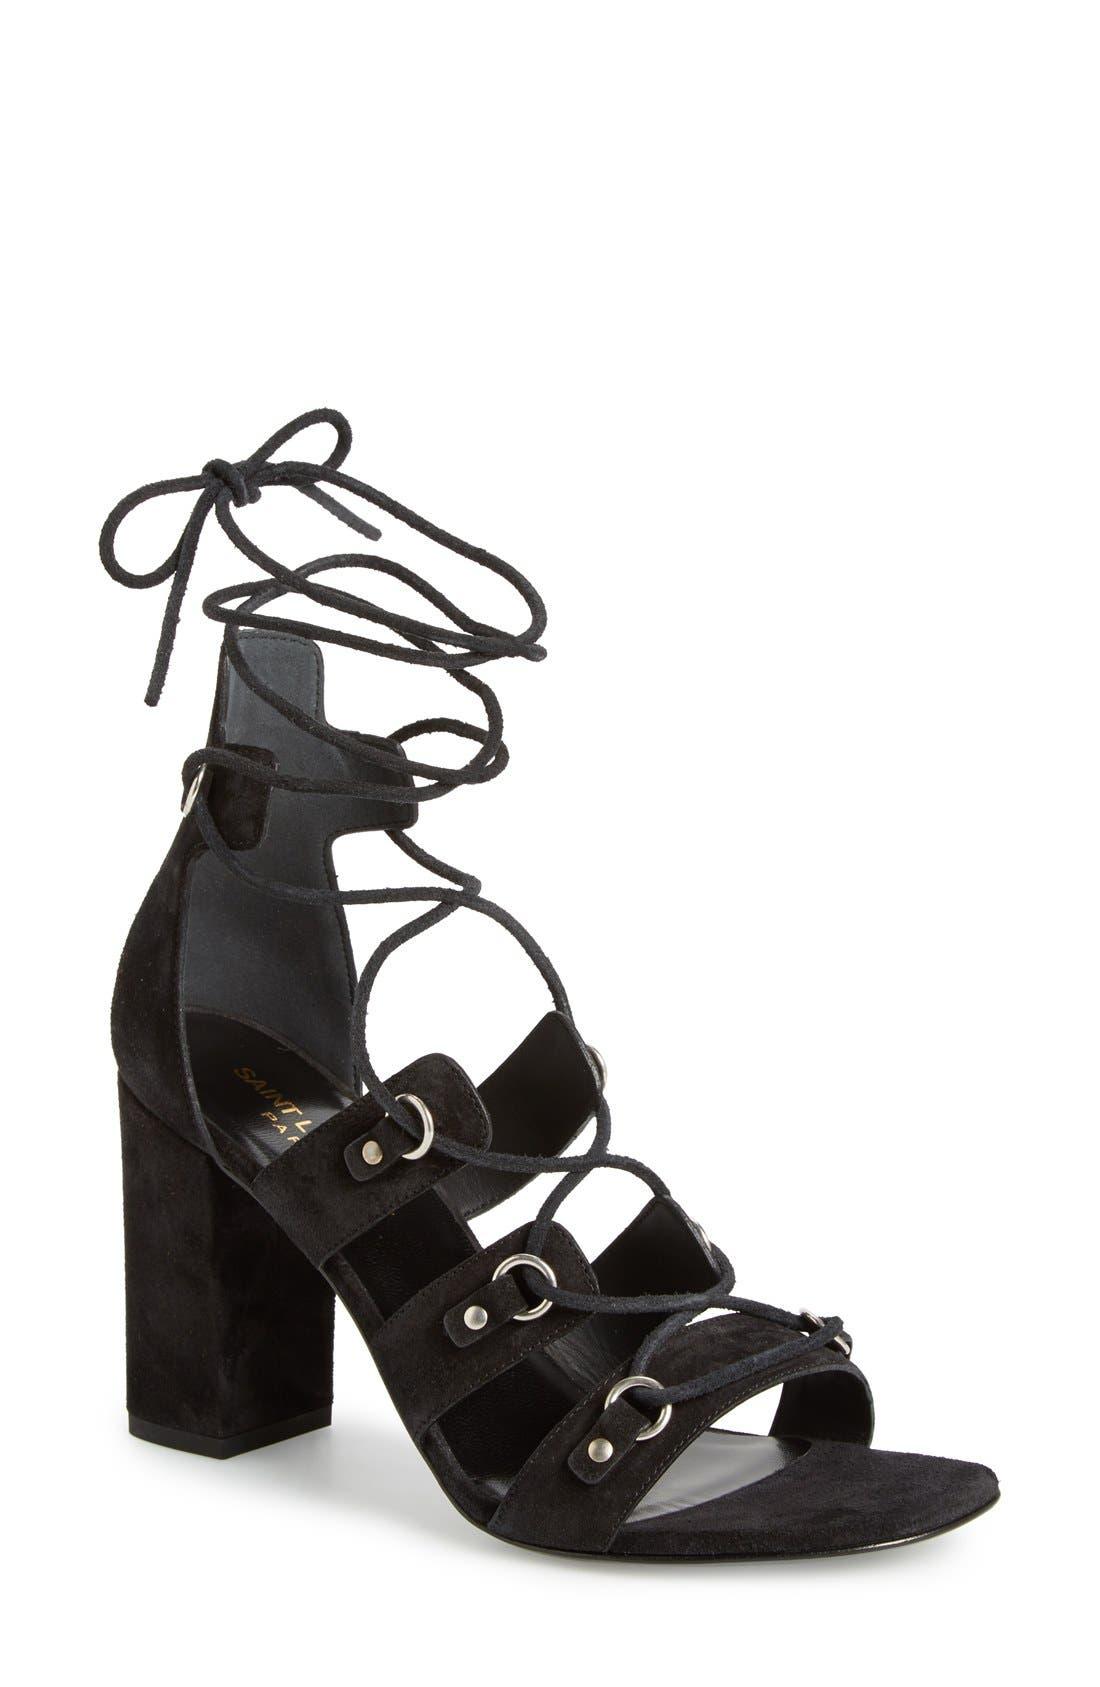 Alternate Image 1 Selected - Saint Laurent 'Babies Eyelet' Block Heel Ghillie Sandal (Women)